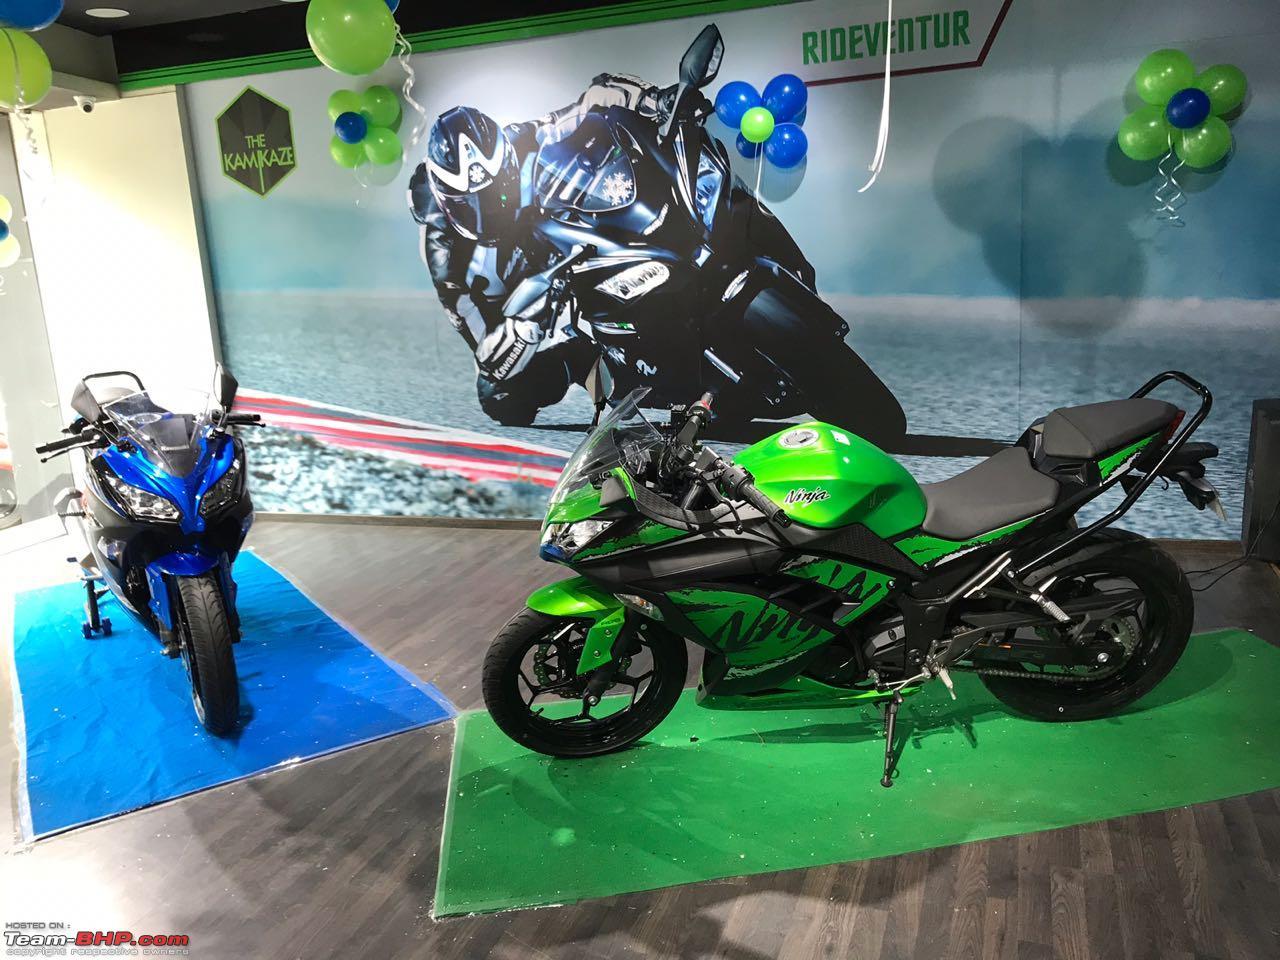 A Close Look The 2019 Kawasaki Ninja 300 Abs Team Bhp